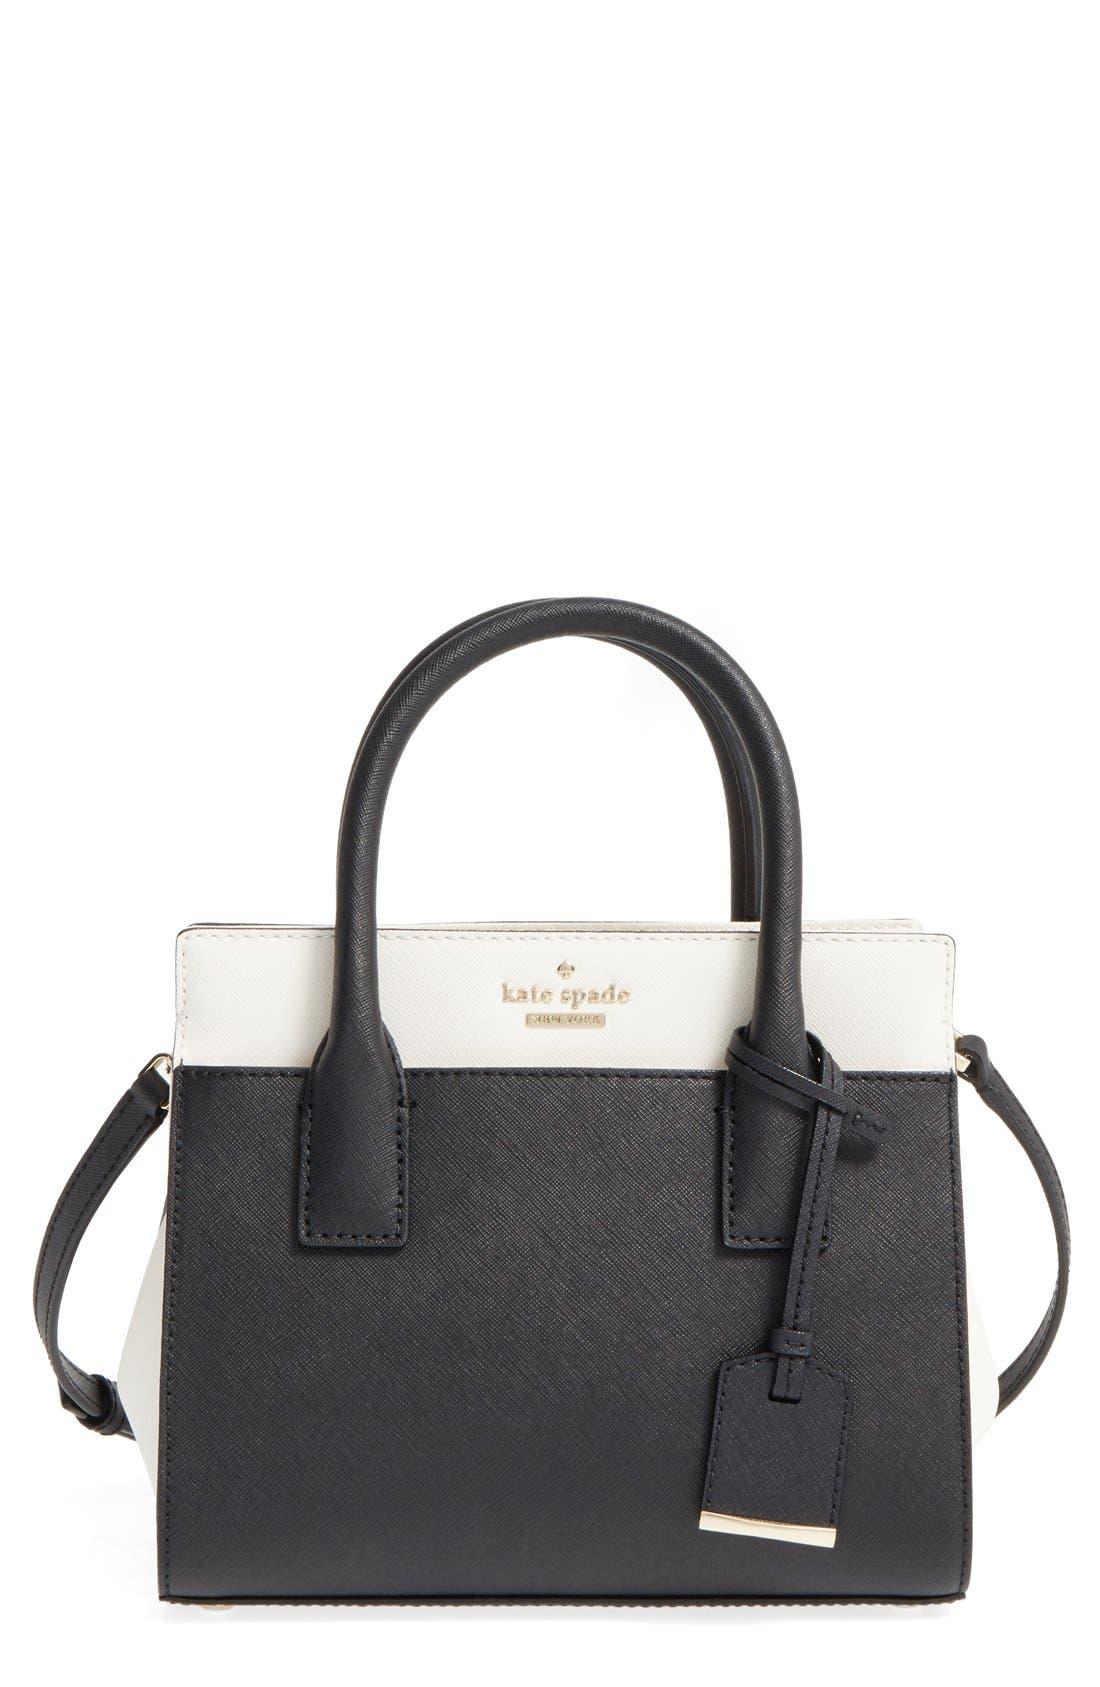 'cameron street - mini candace' leather satchel,                         Main,                         color, Black/ Cement